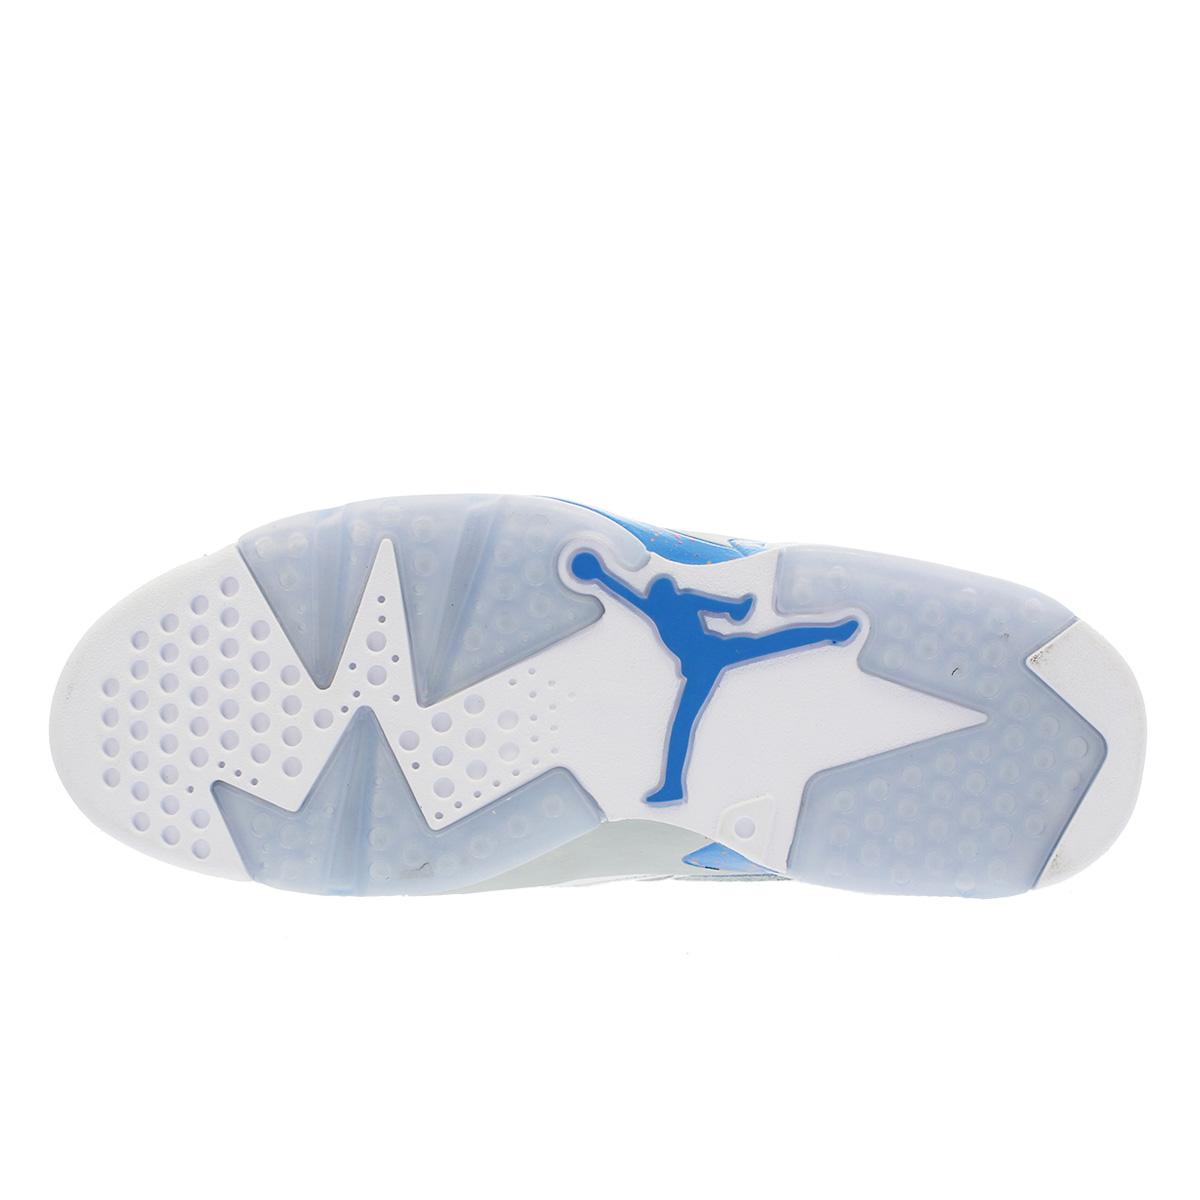 957127218568 JORDAN FLIGHT CLUB 91 ナイキ ジョーダン フライトクラブ 91 WHITE/BLUE ...